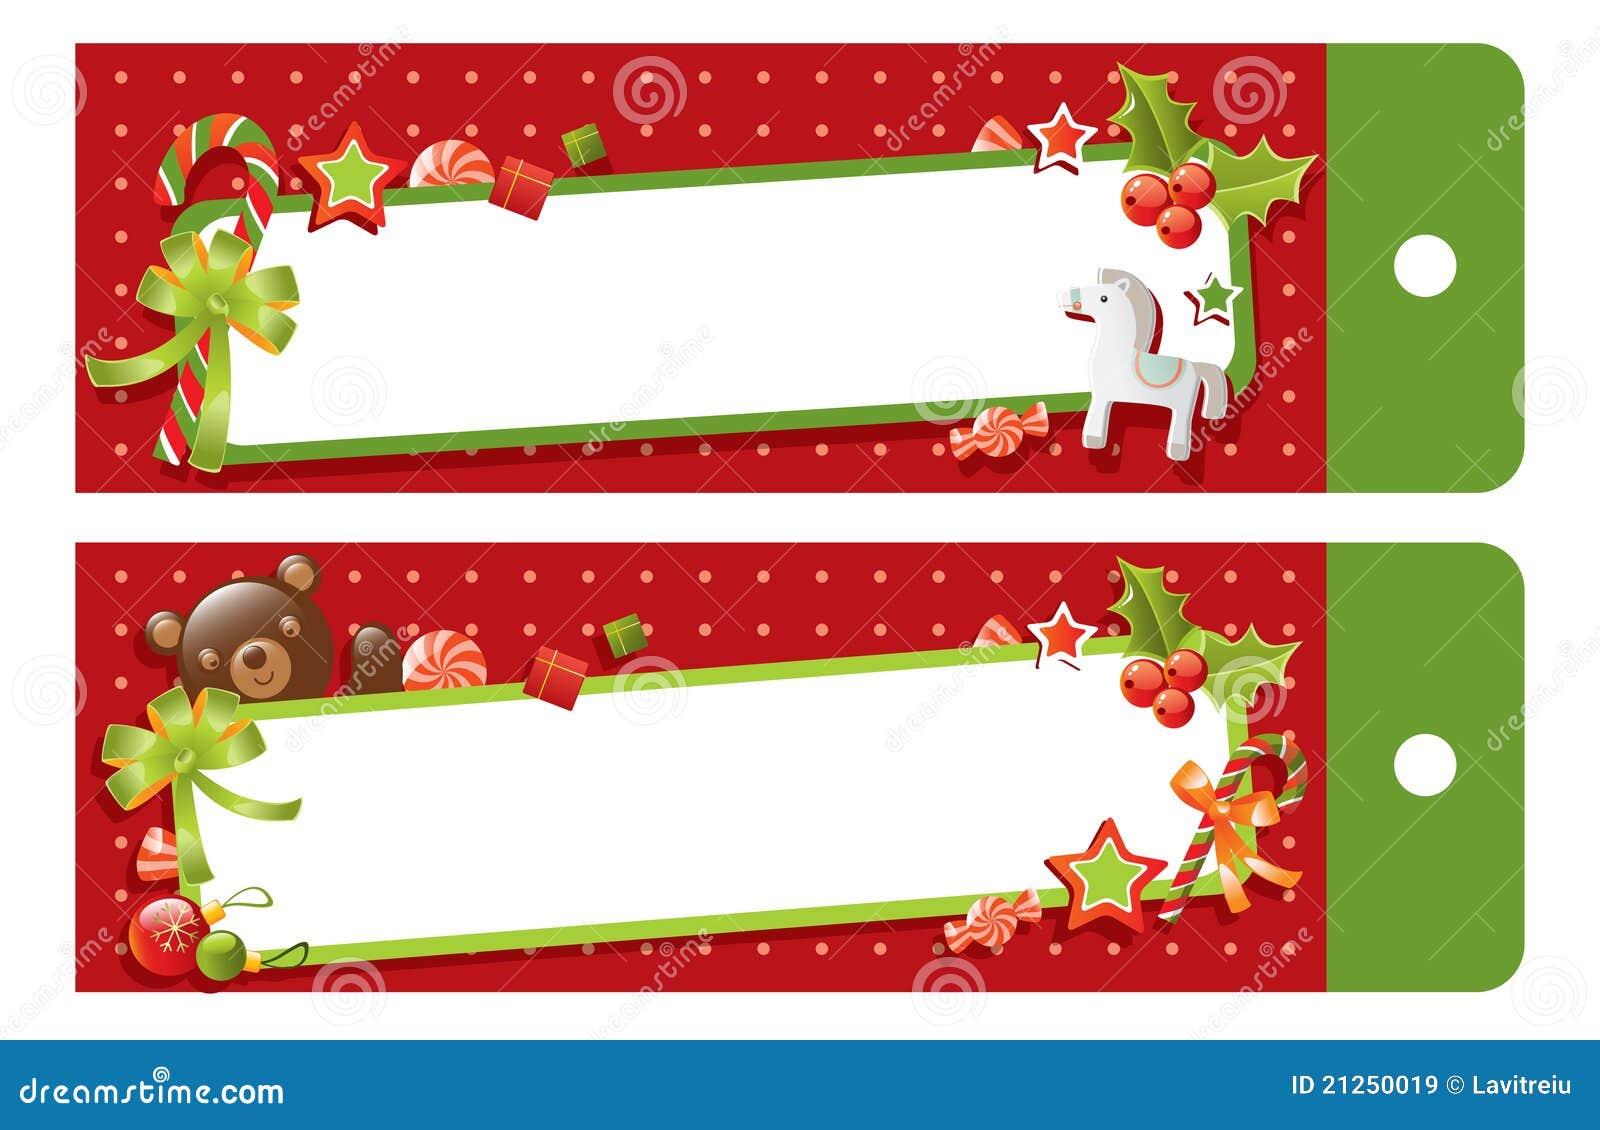 Tiquette de cadeau de no l images libres de droits image 21250019 - Vente de cadeau de noel ...